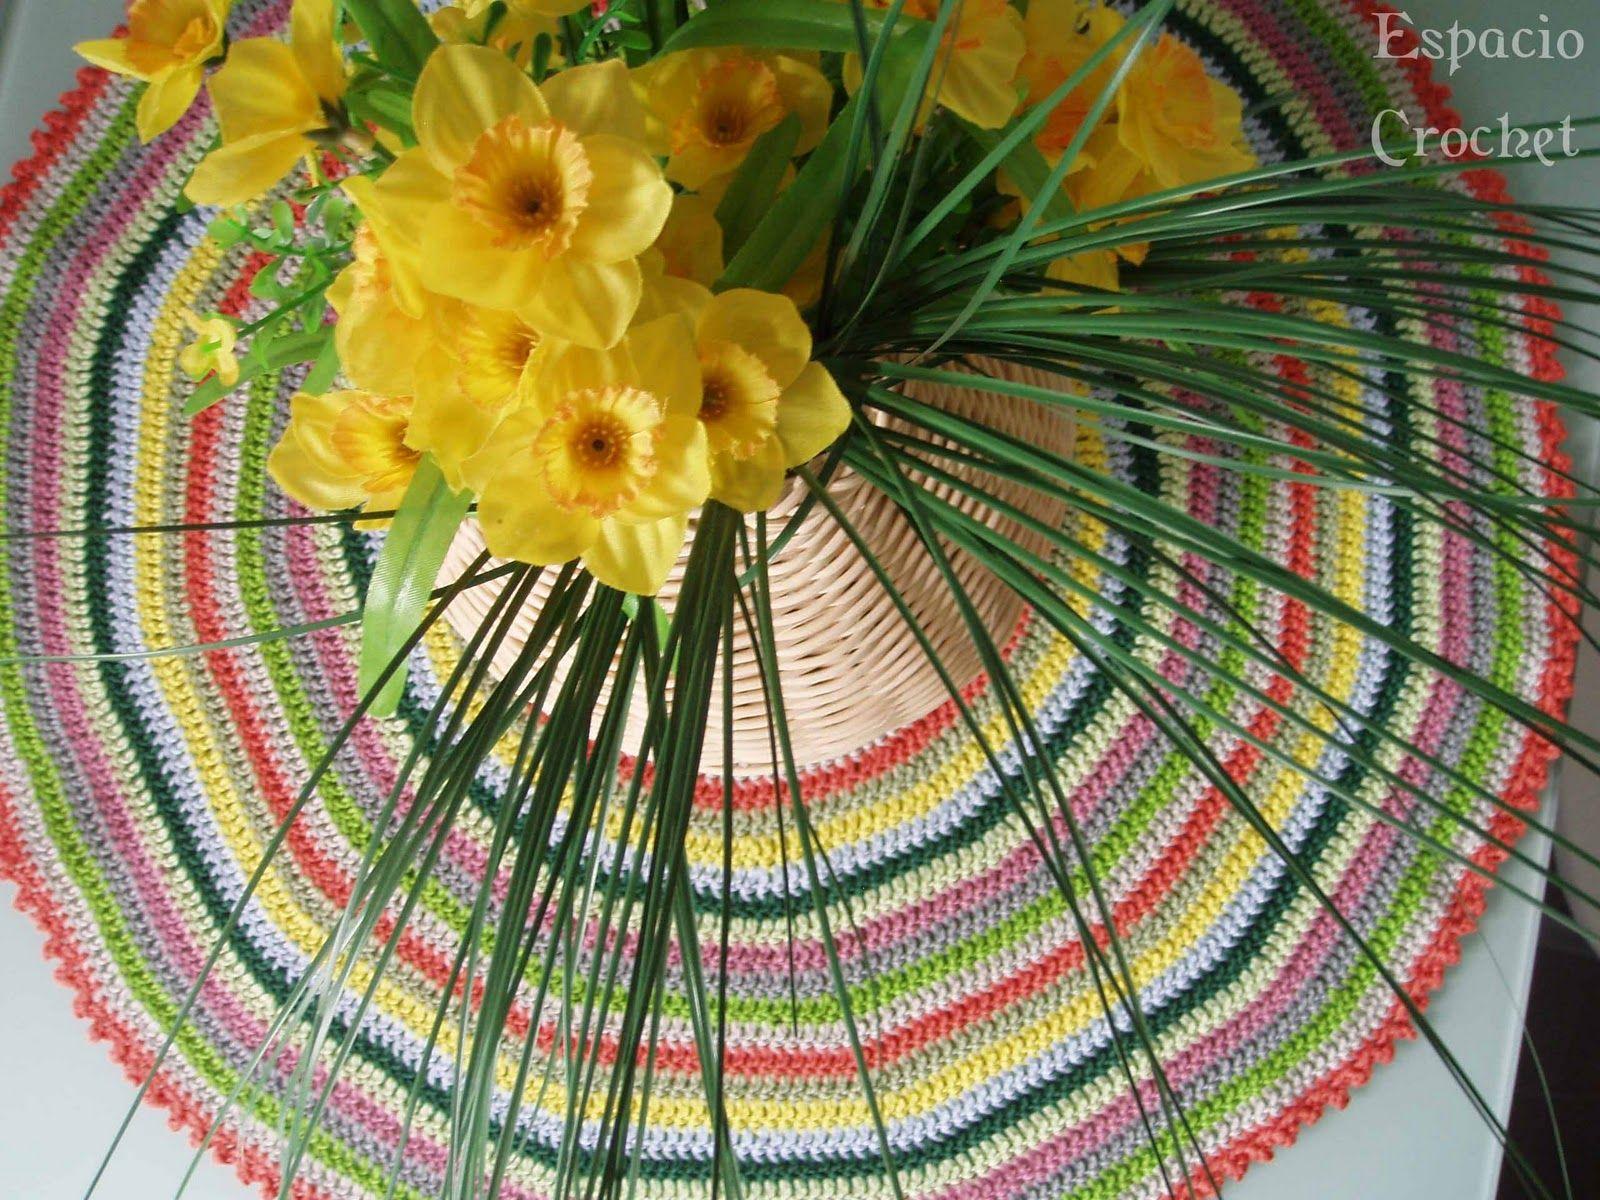 Espacio Crochet: Tapete de ganchillo